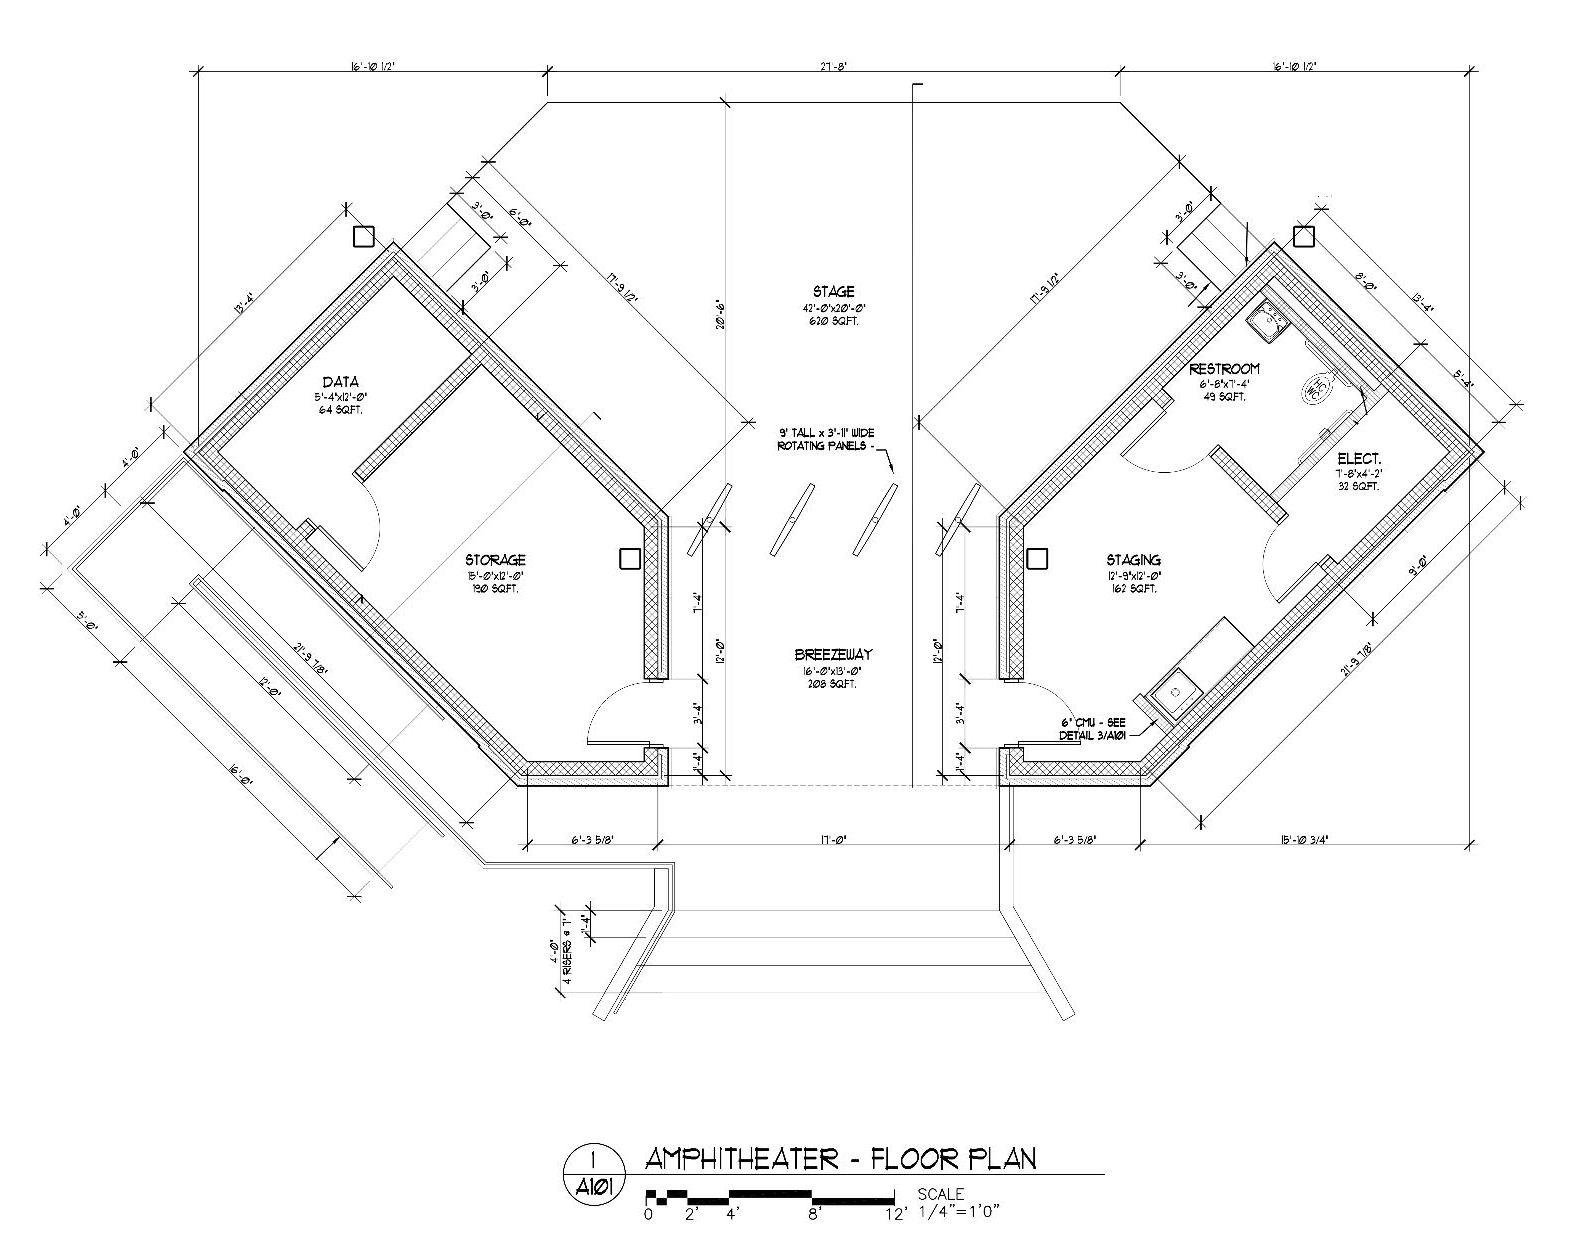 The Ritz Amphitheater